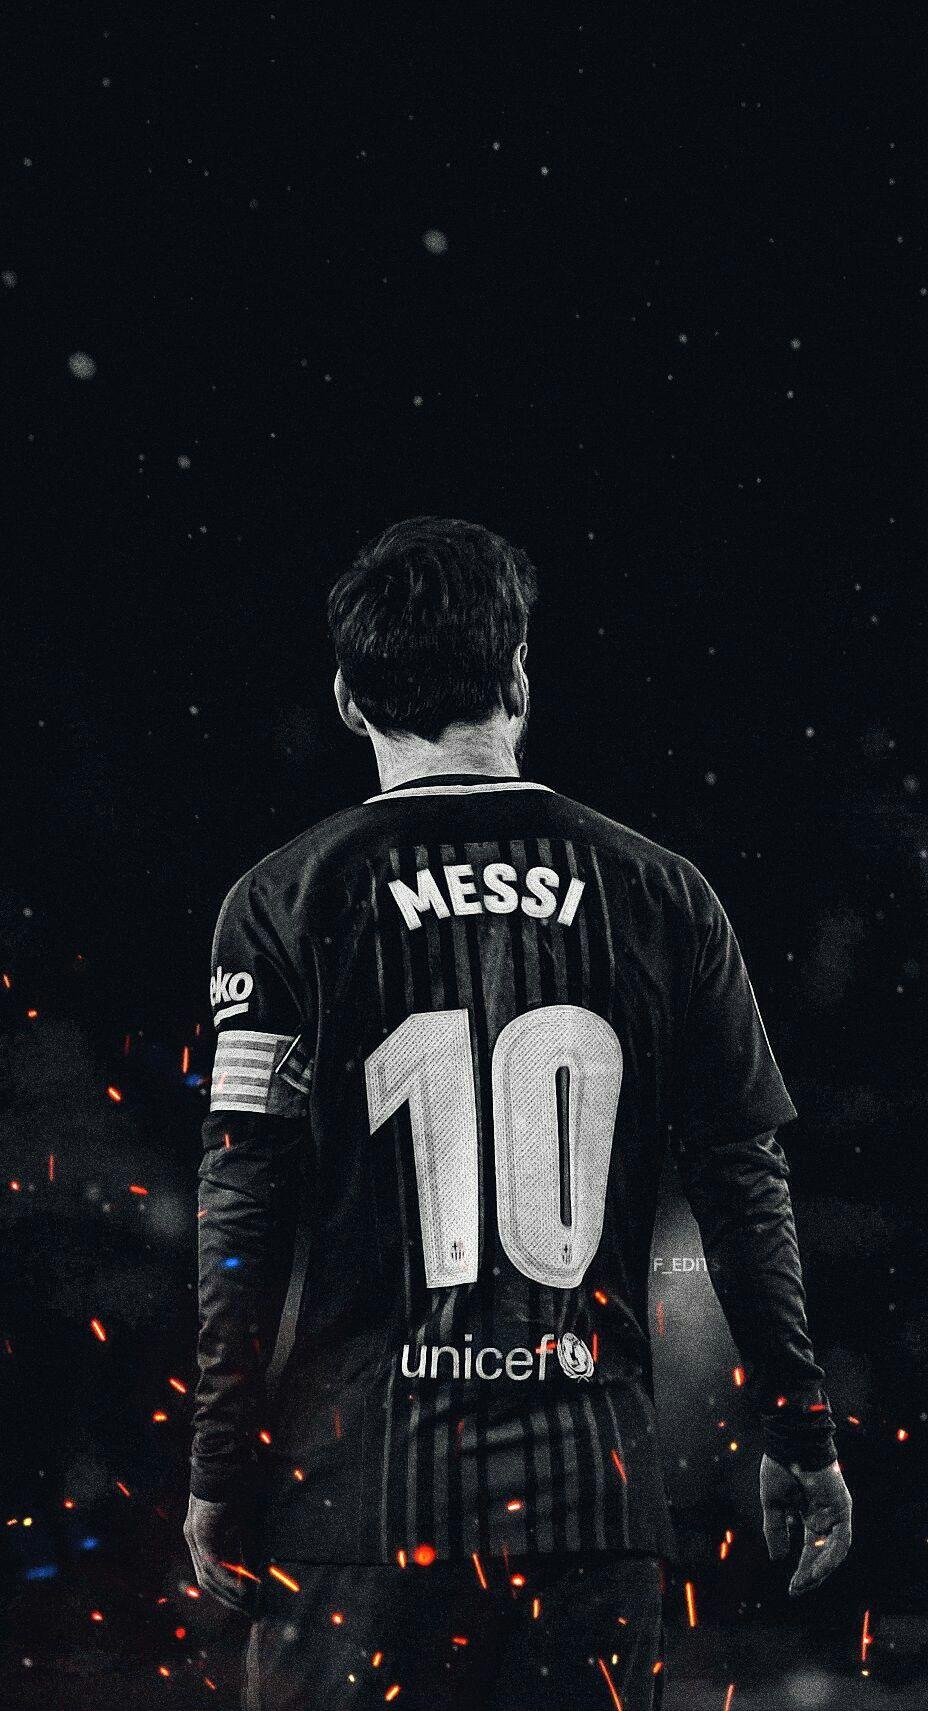 Lionel Messi 10 Messi Lionel Messi Leonel Messi